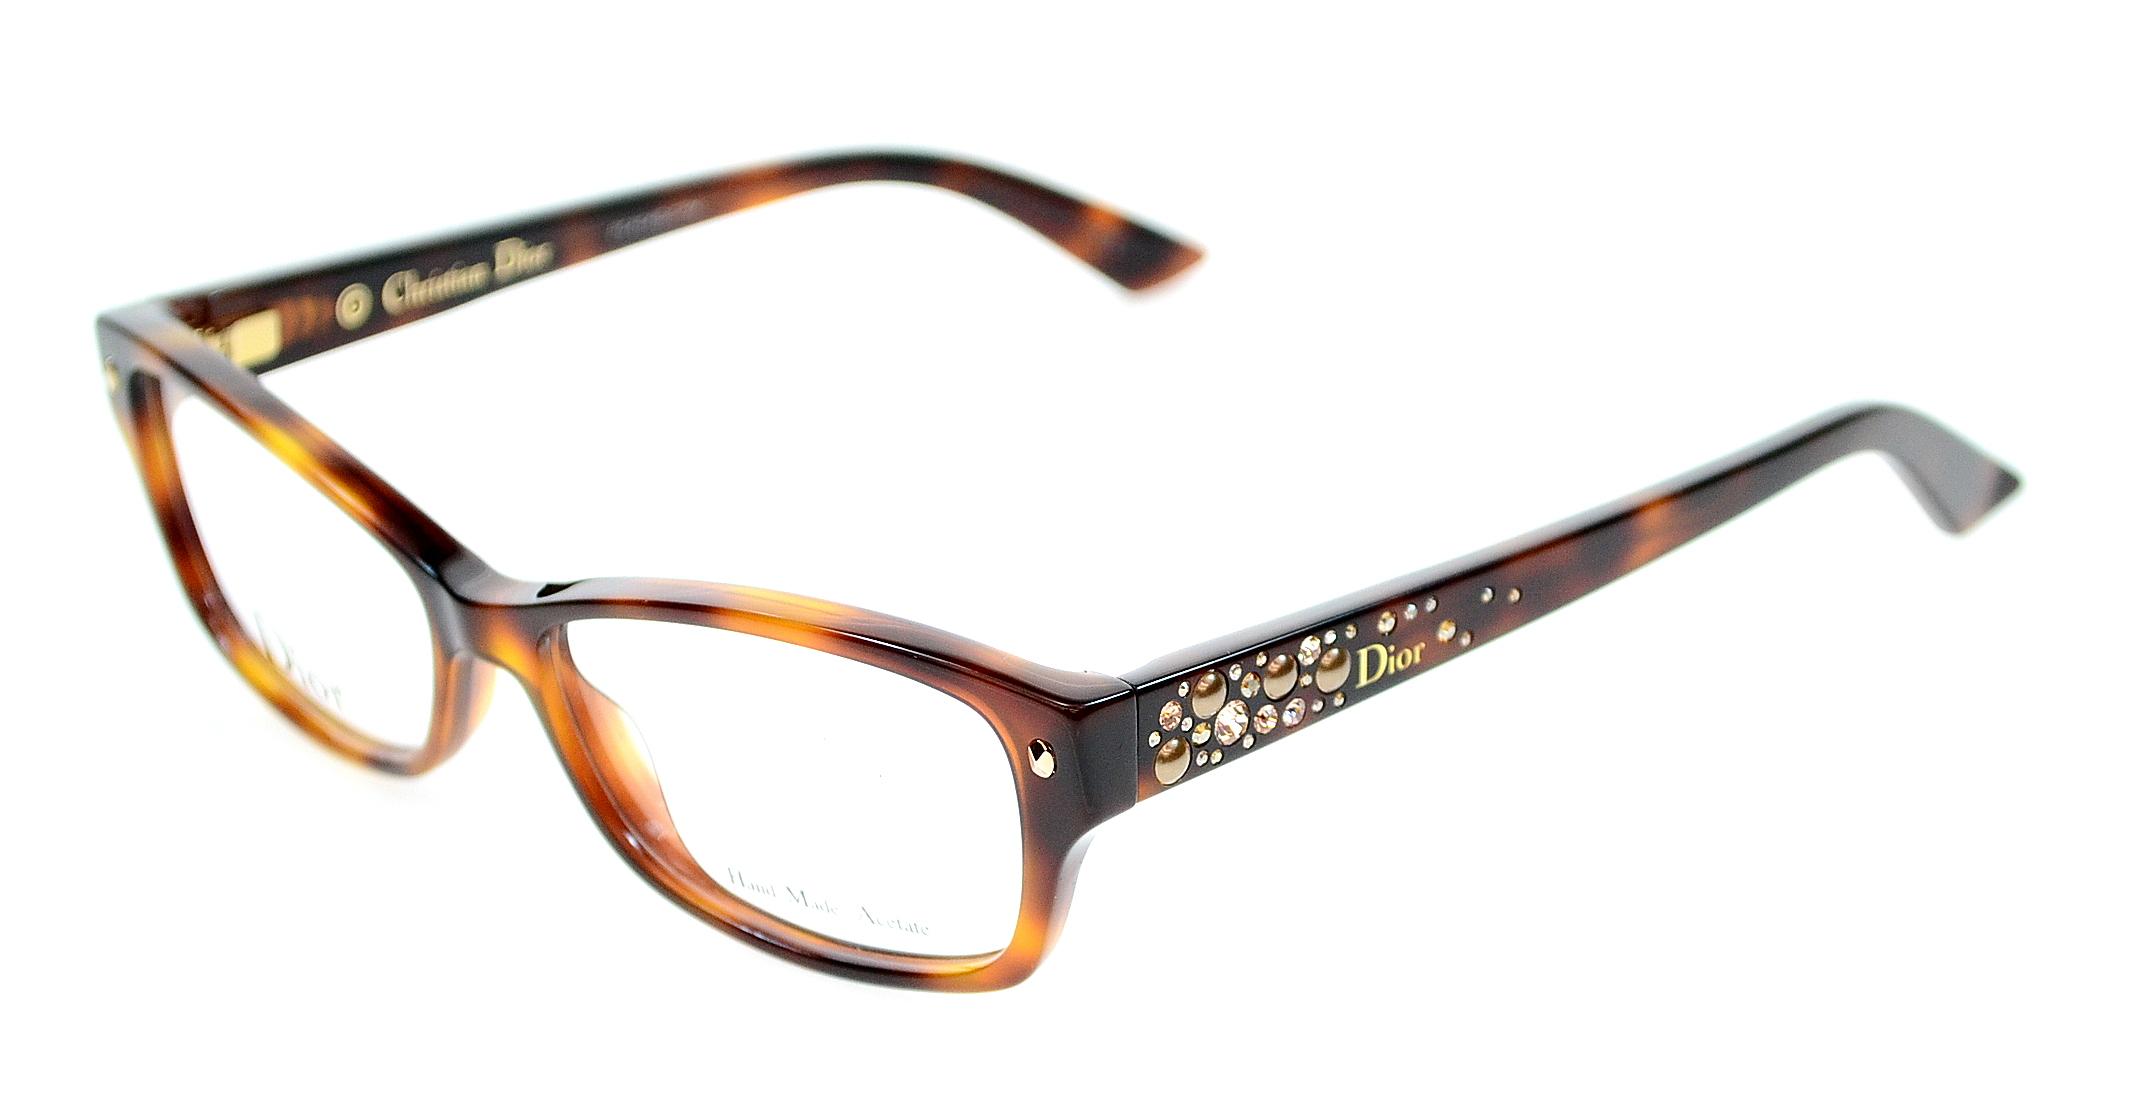 Dior Eyeglass Frames 2014 : Christian Dior Eyeglasses 3259 05L Havana 52 mm eBay